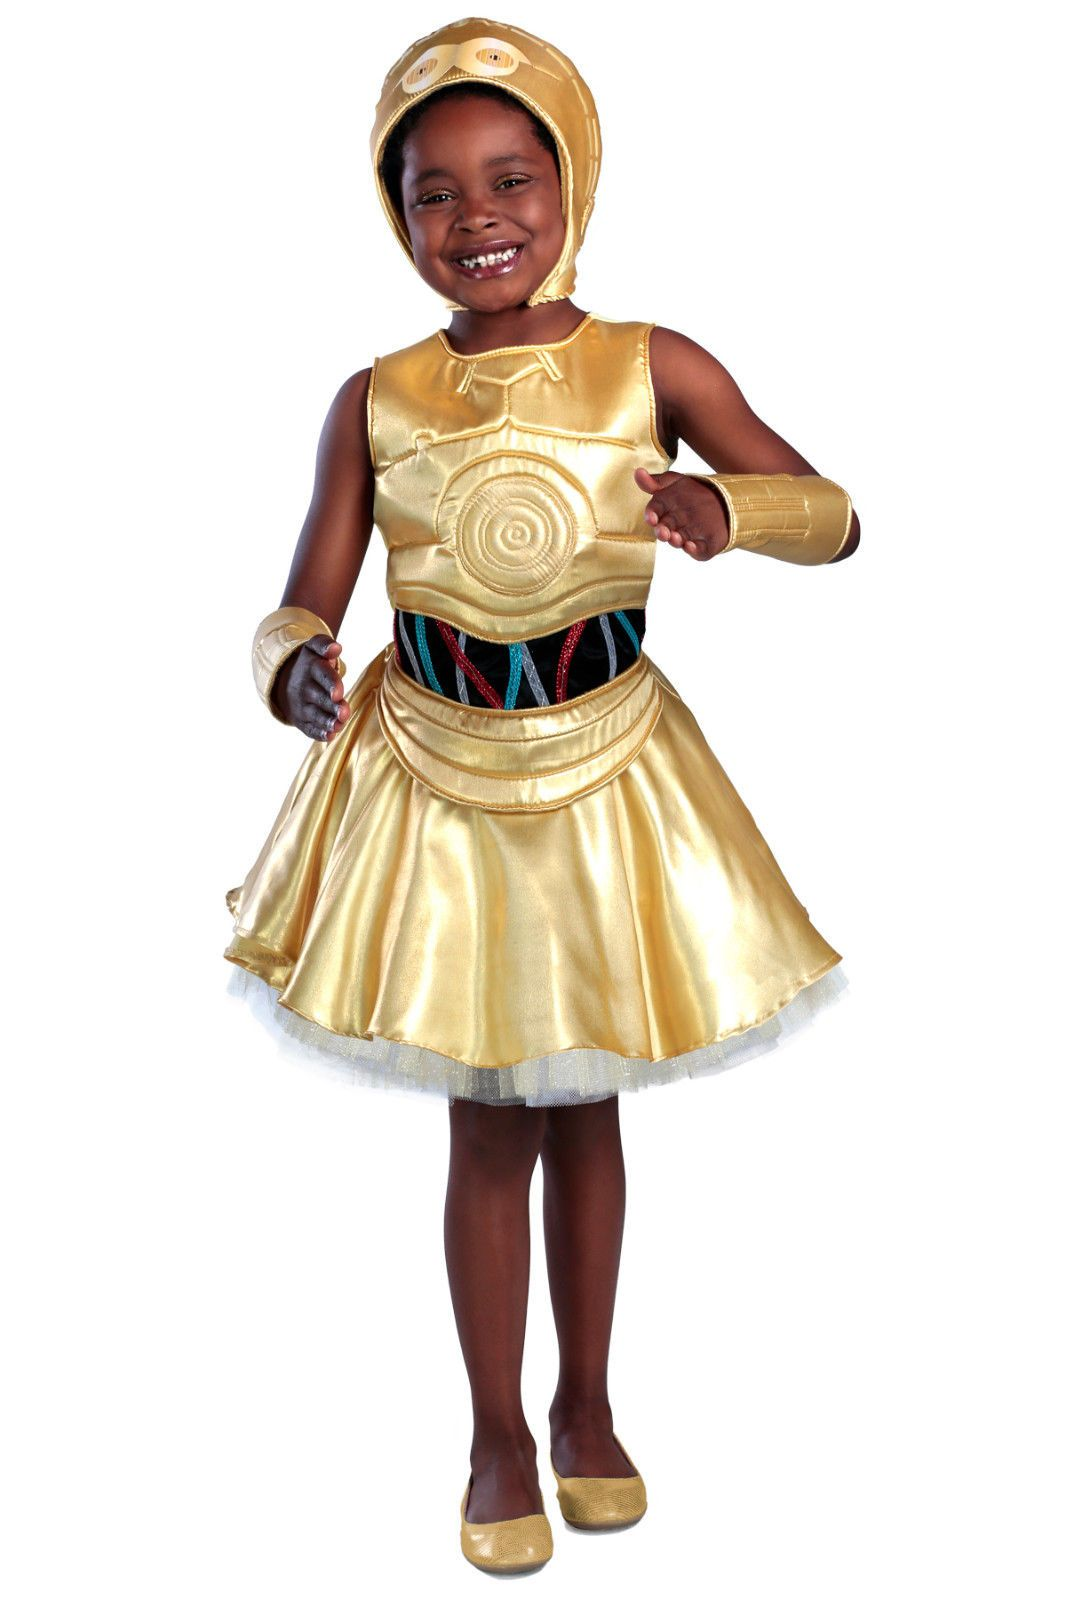 EWOK Wicket PREMIUM Deluxe Classic Star Wars Costume Child 3 4 5 6 7 8 9 10 12